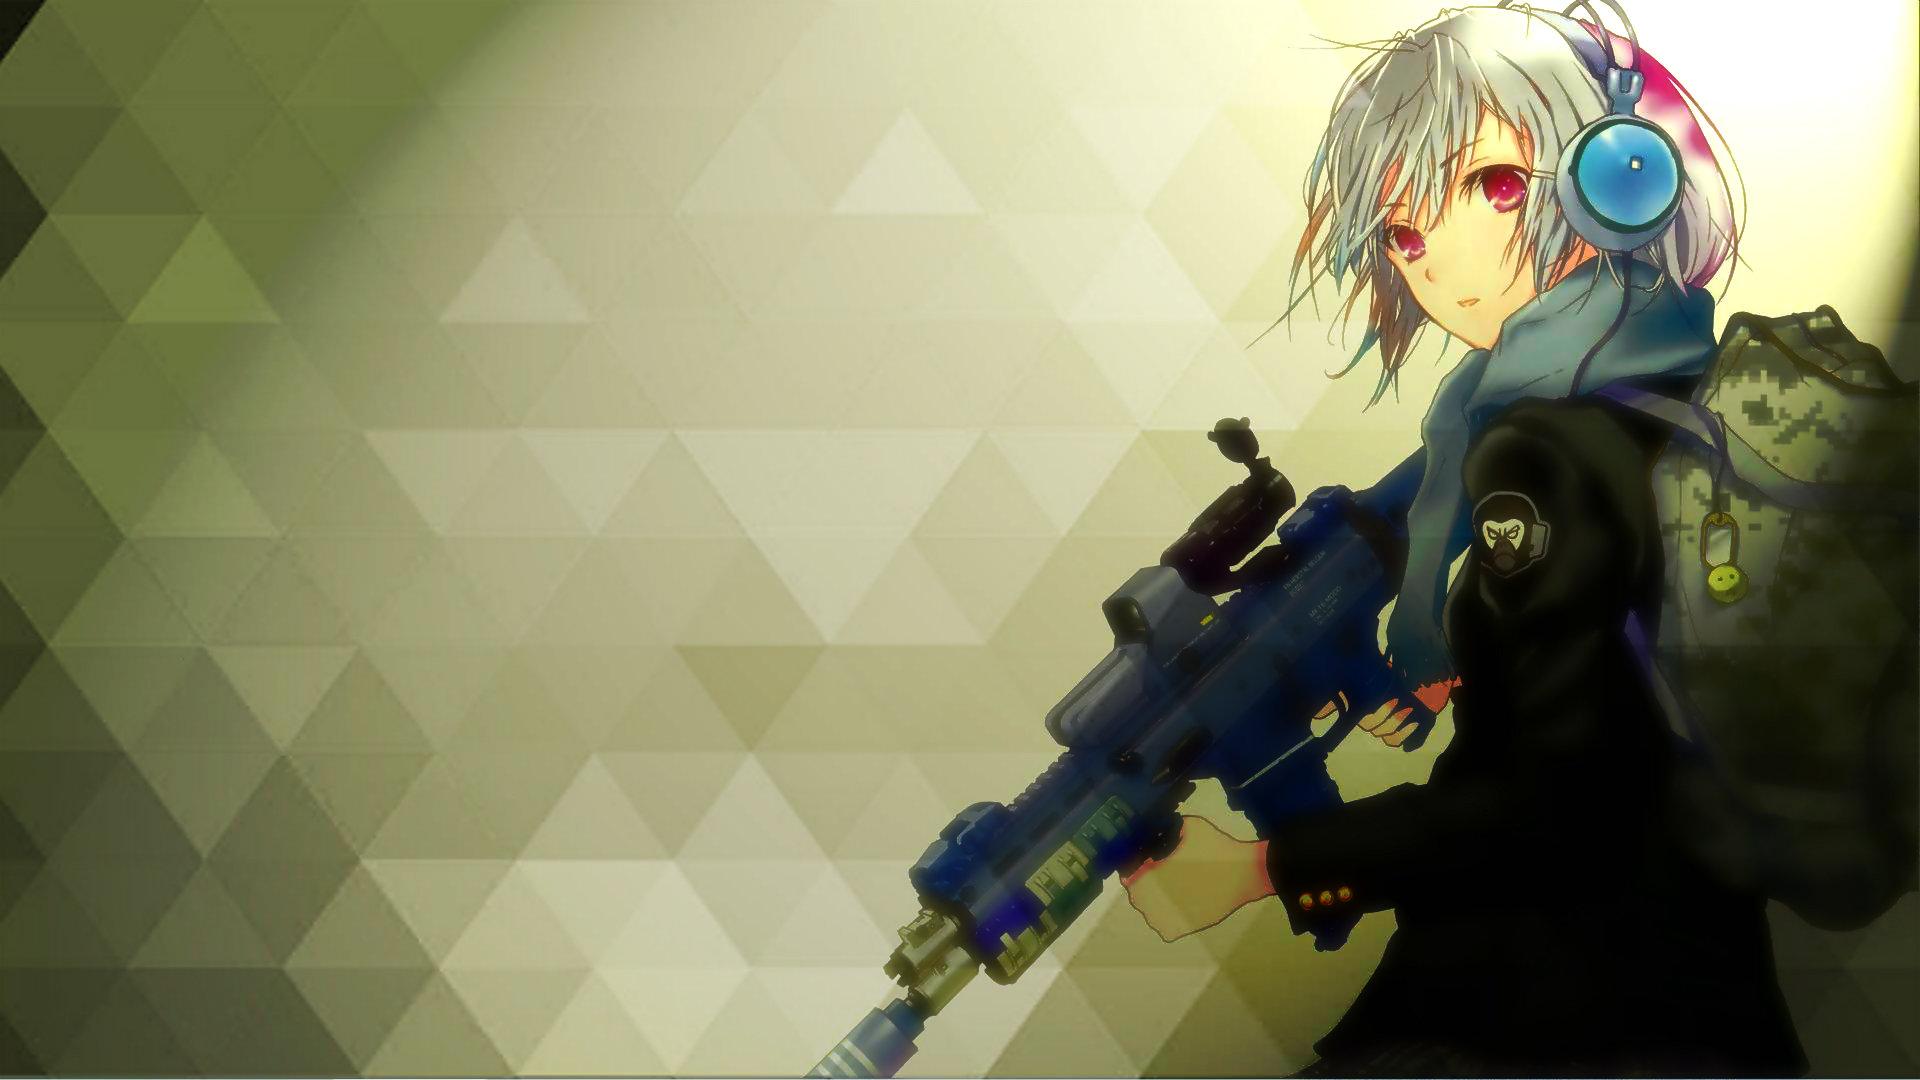 High Resolution Cool Anime Full Hd 1080p Wallpaper Id 365464 For Desktop